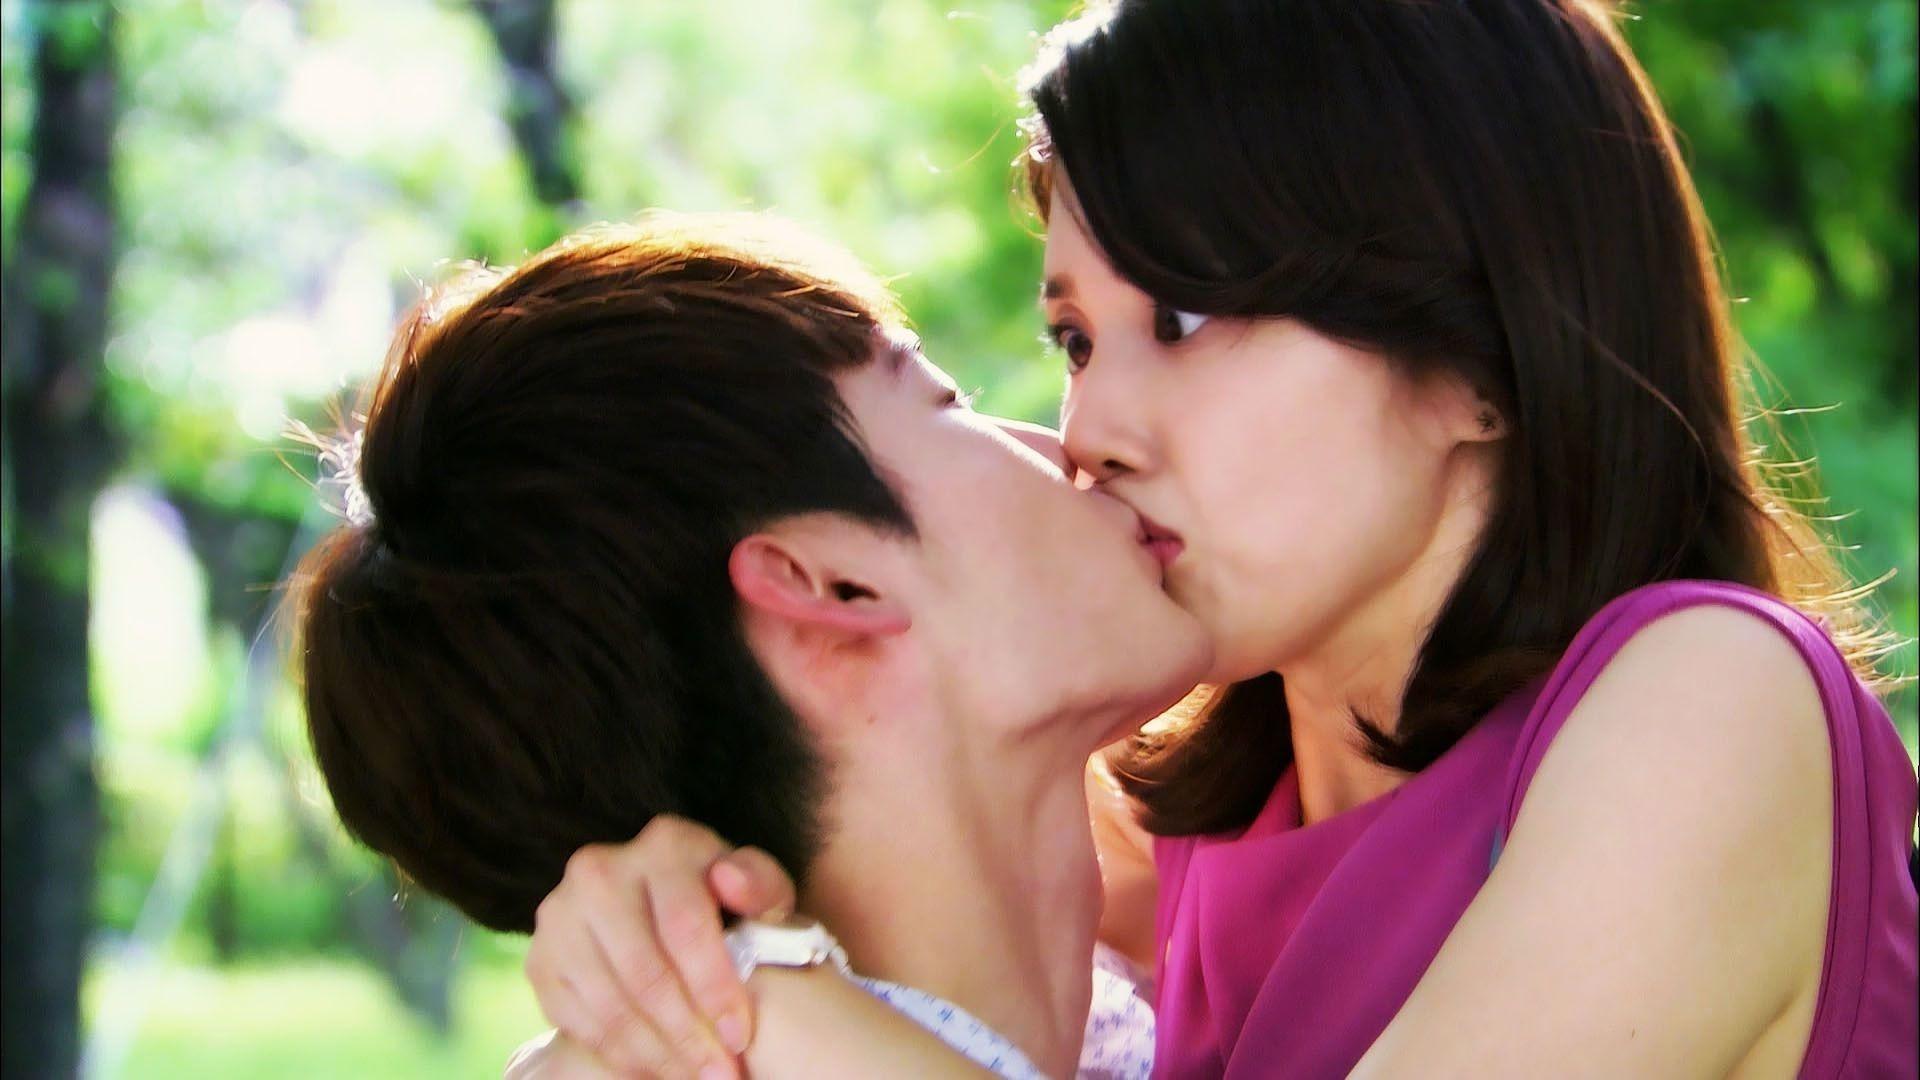 Romantic boy kiss to pretty girl shocked